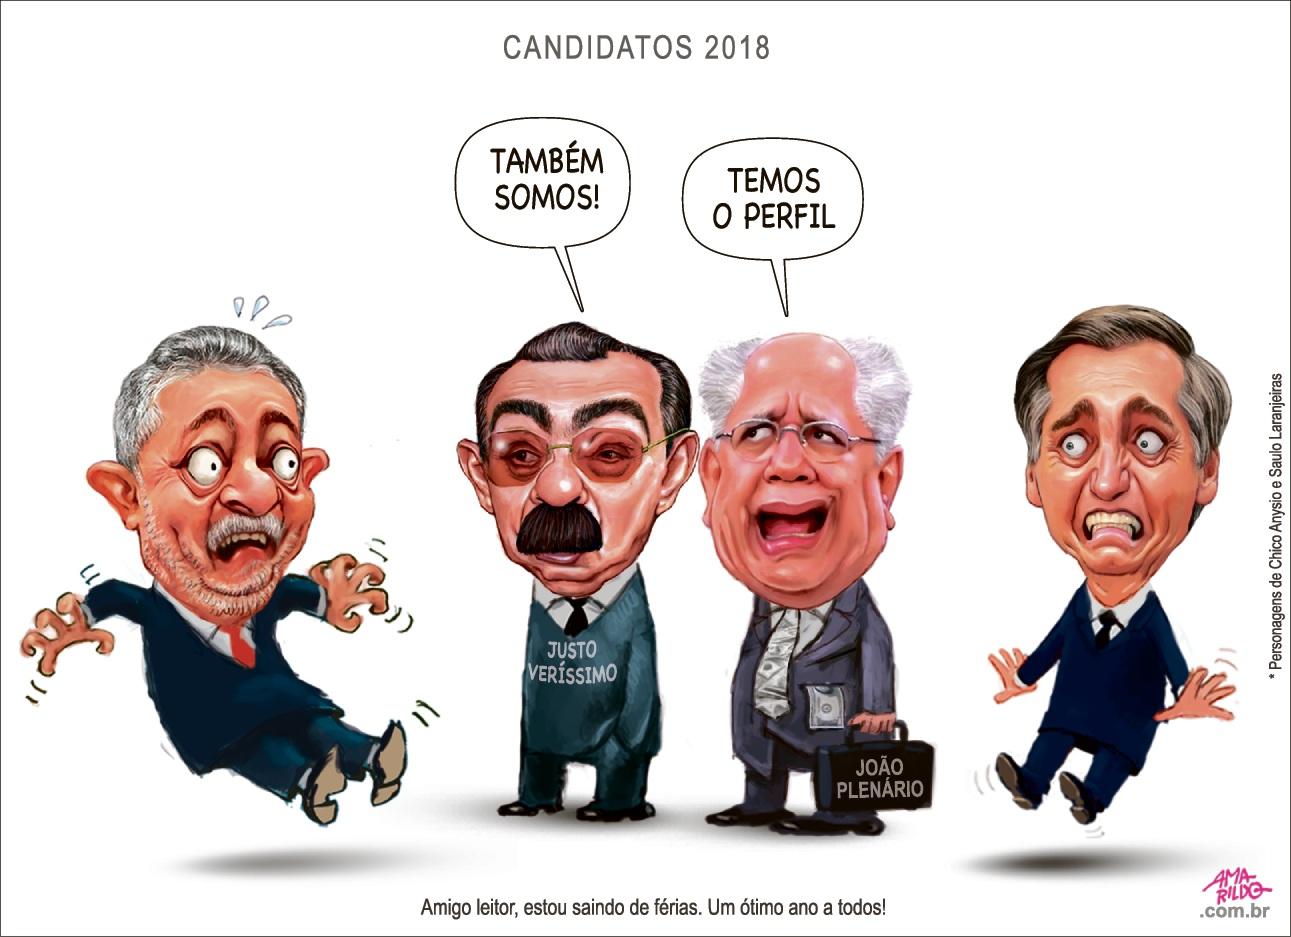 Charge Amarildo | 16/01/18. Crédito: Amarildo